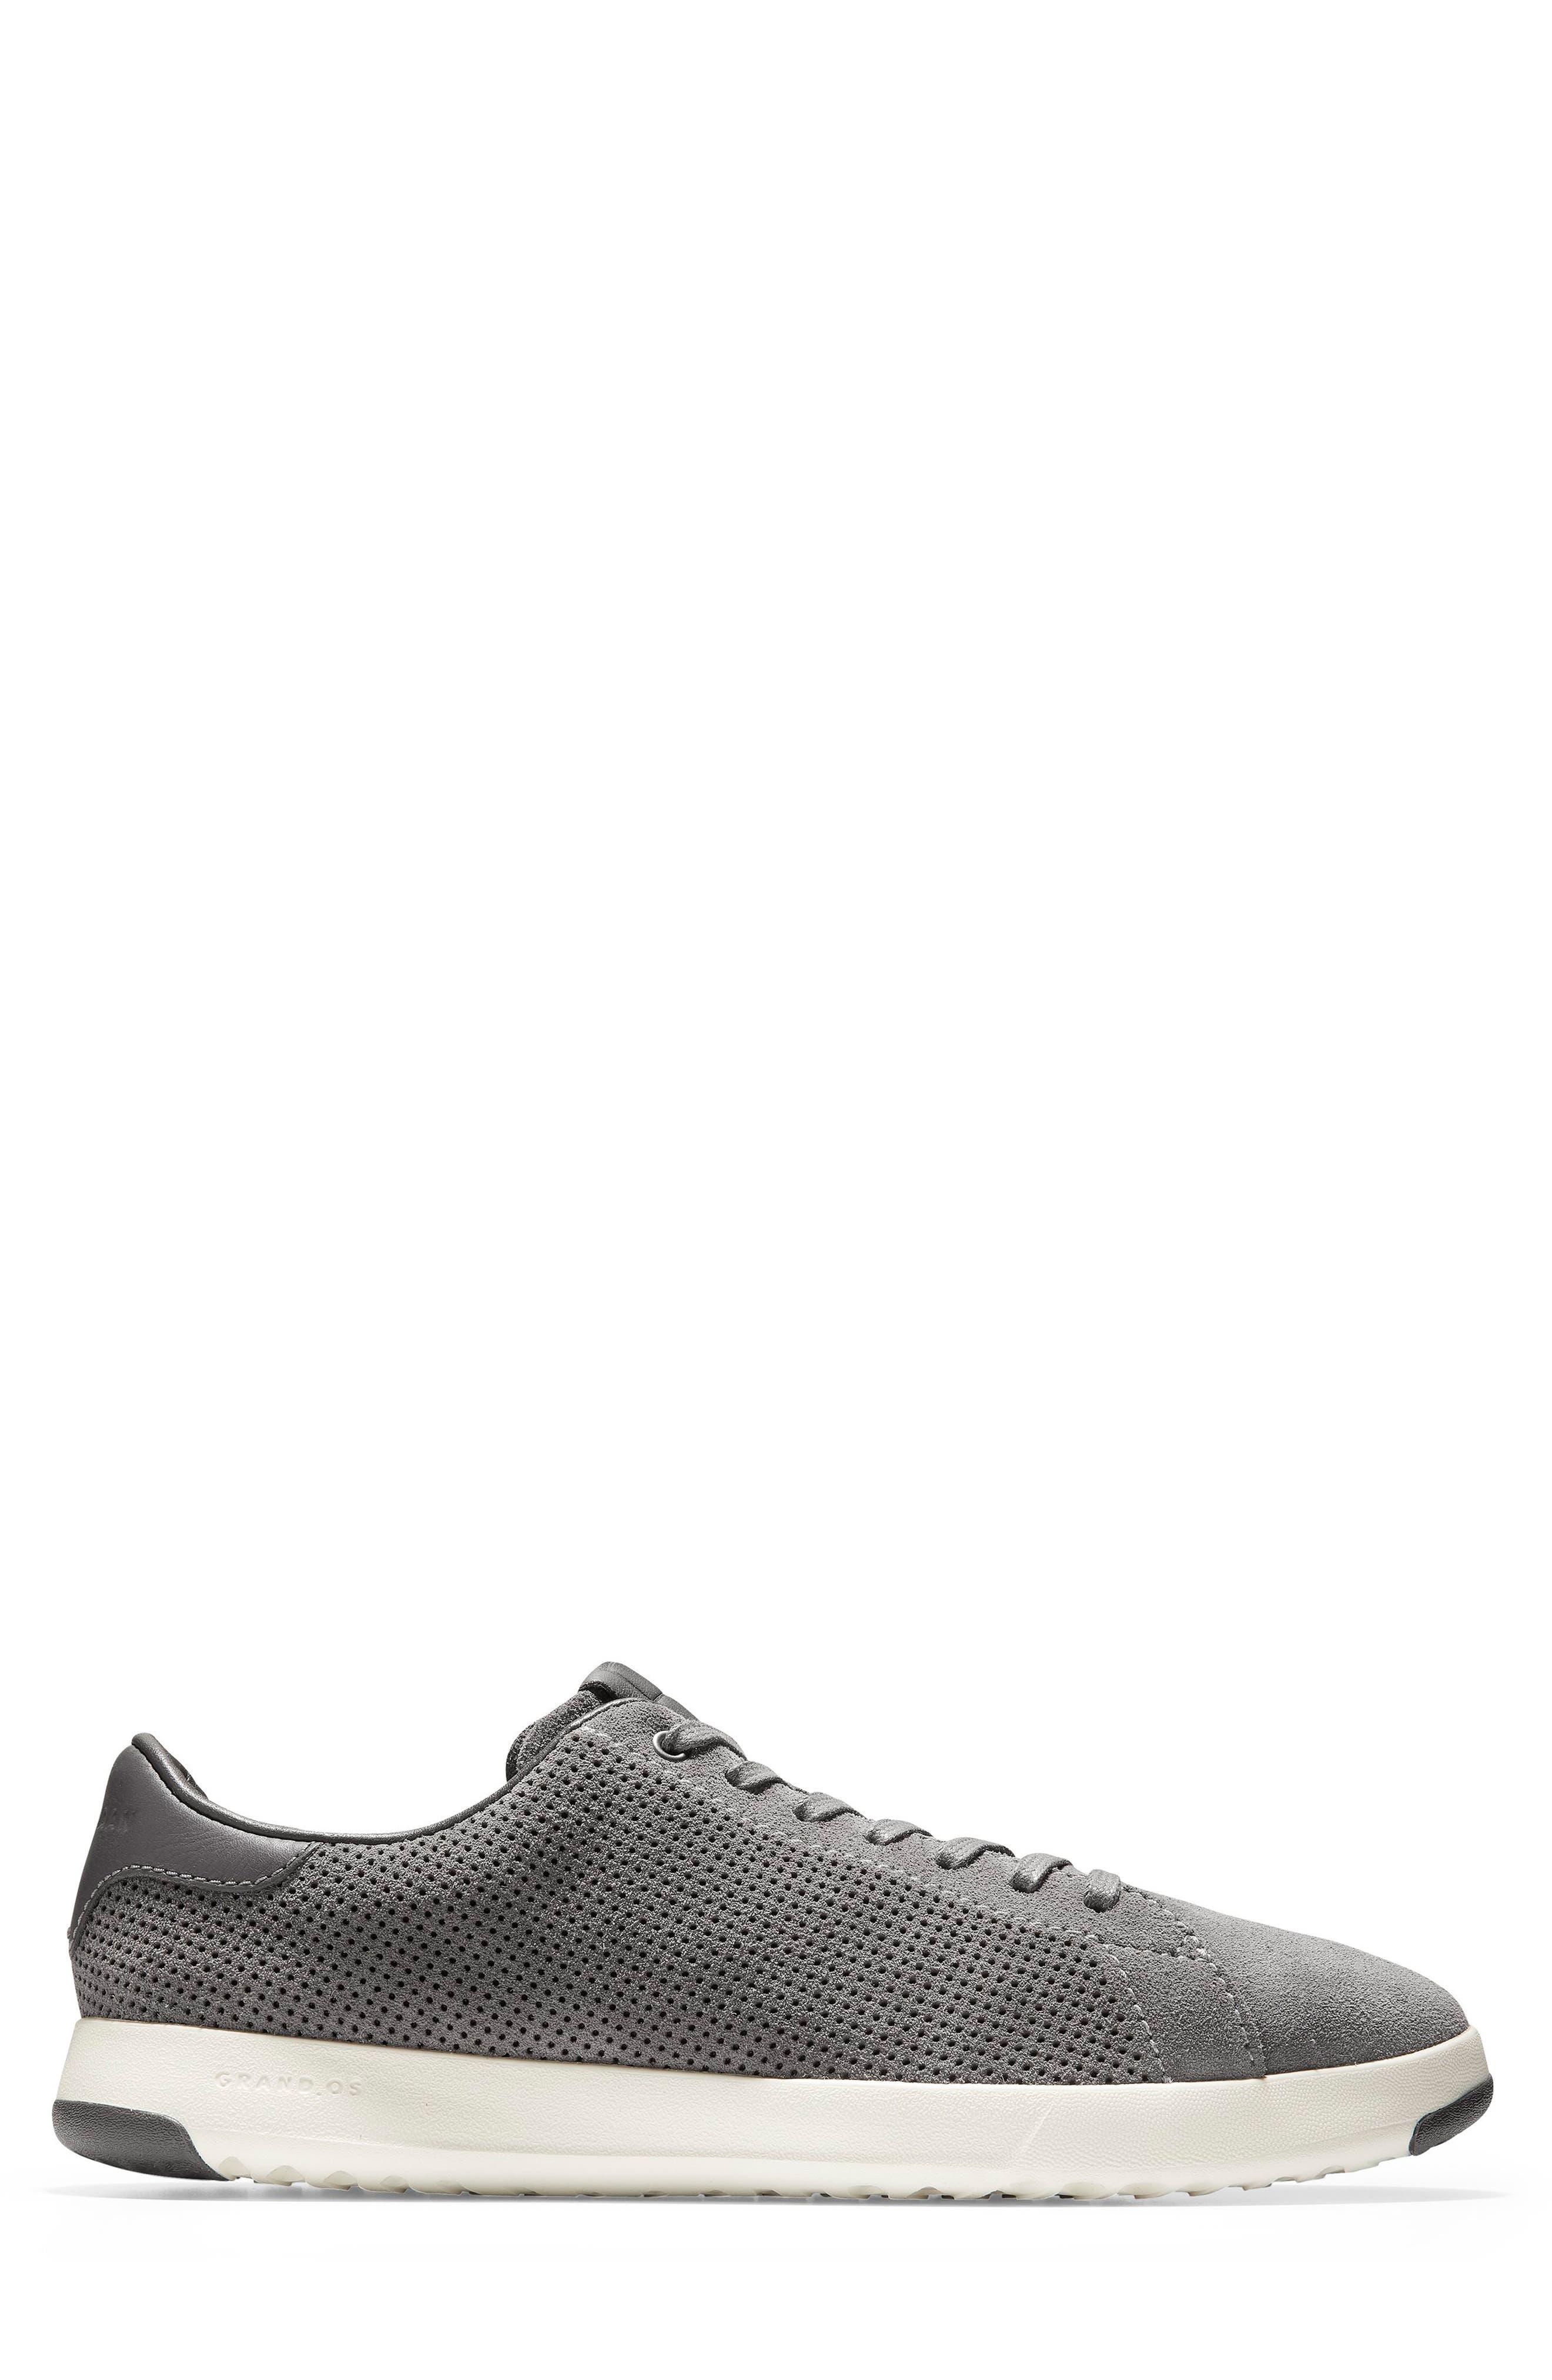 GrandPro Tennis Sneaker,                             Alternate thumbnail 3, color,                             GREY SUEDE